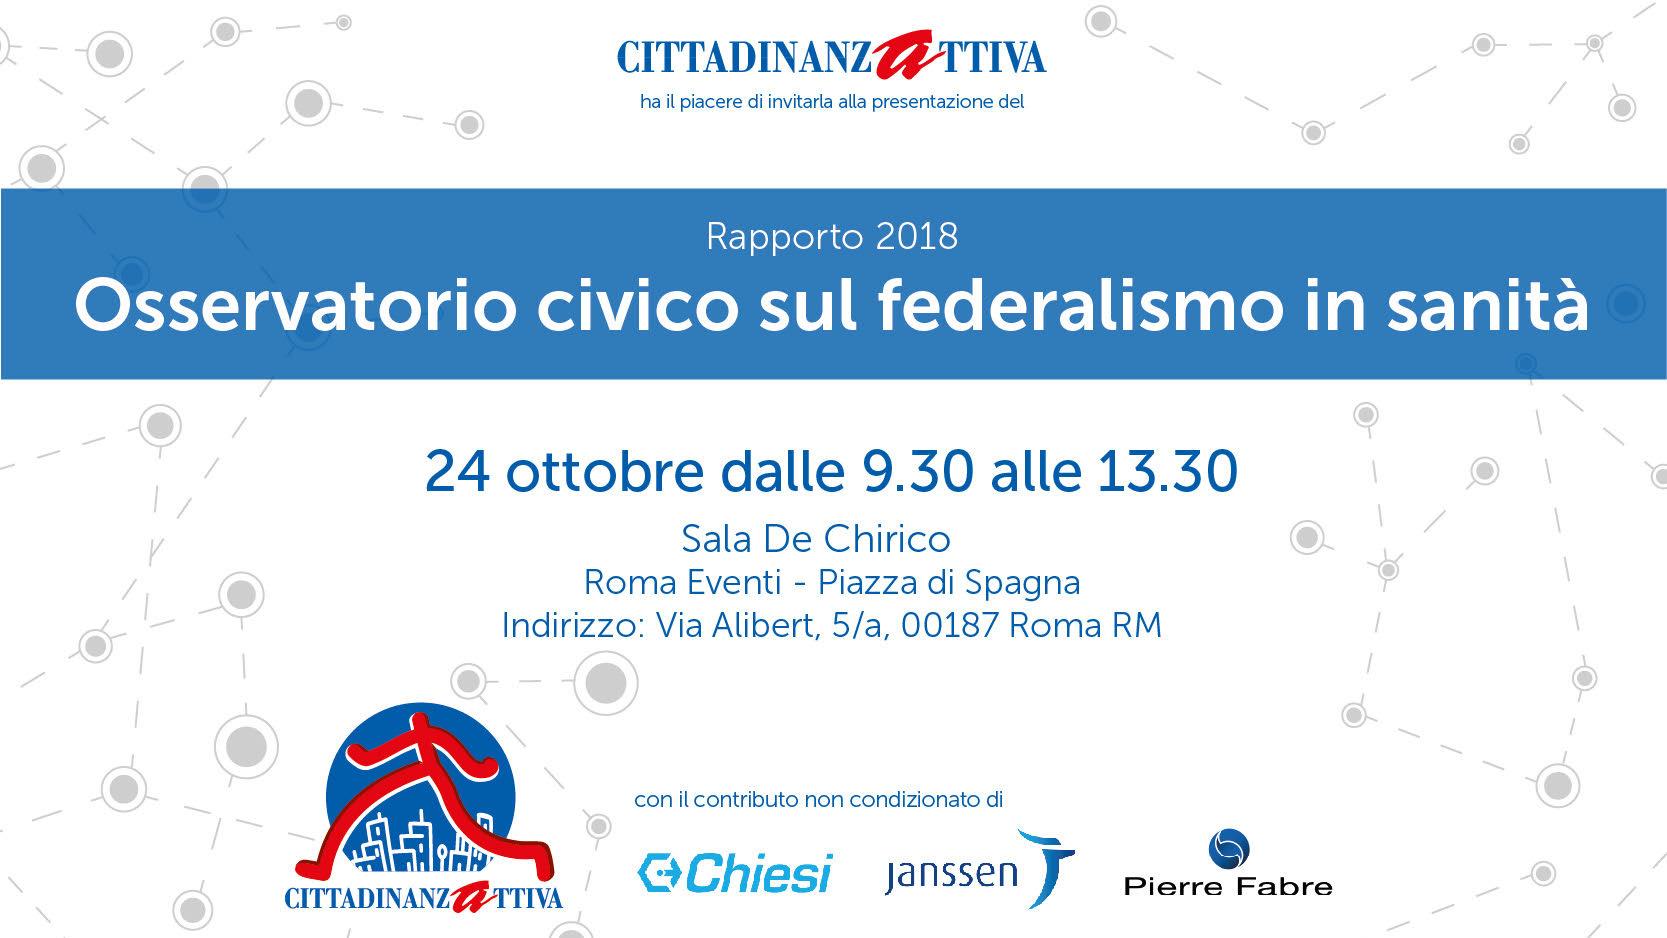 locandina evento cittadinanzattiva